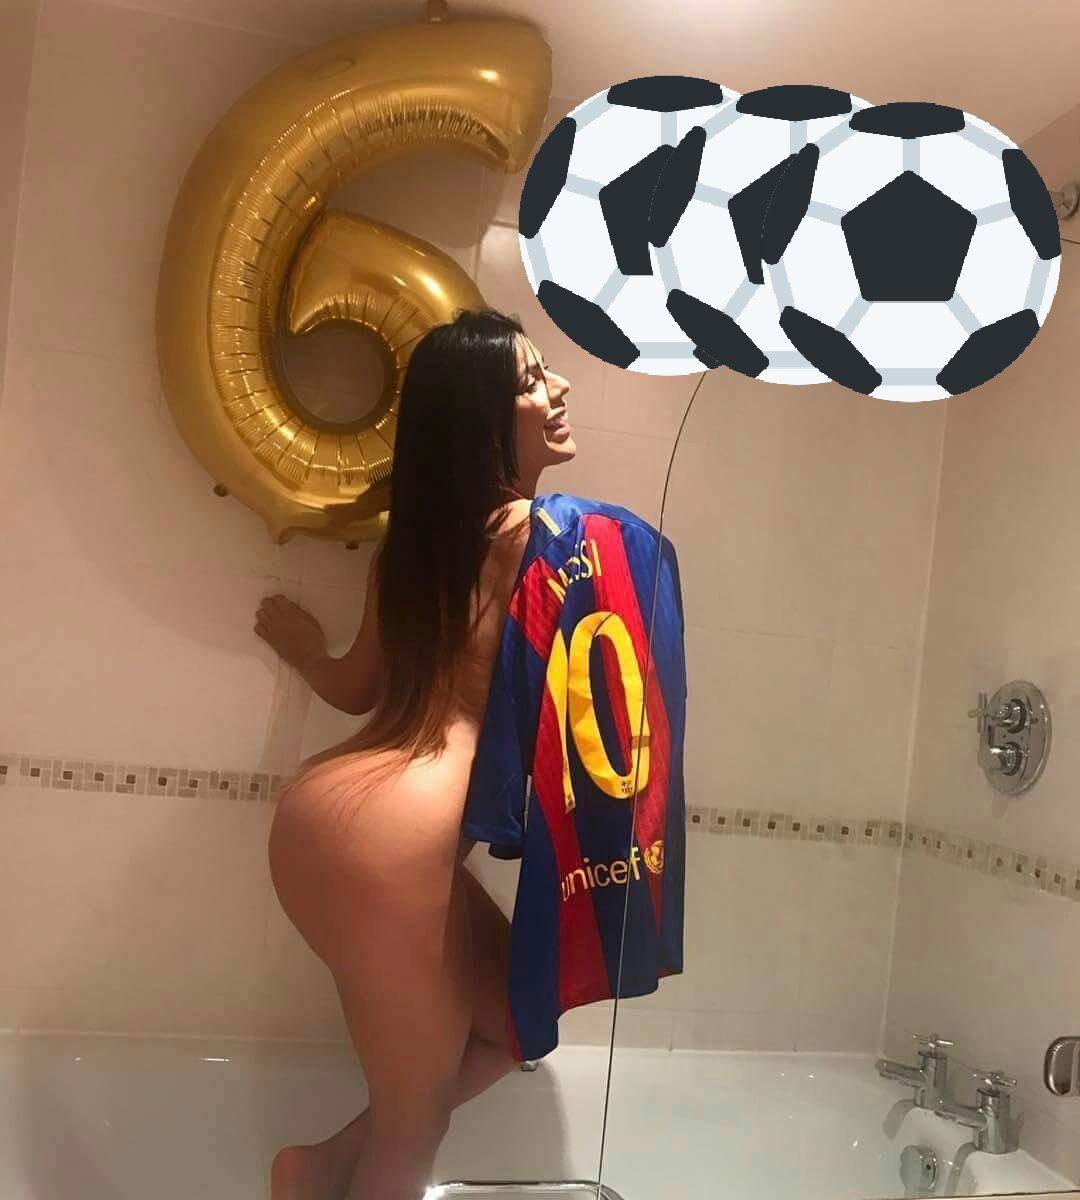 ⚽ GOAL 6️⃣0️⃣0️⃣0️⃣ in @LaLiga: Keep them coming! ???? ????????#BarçaAlavés #Messi ???????? https://t.co/iAWpXVFCYN